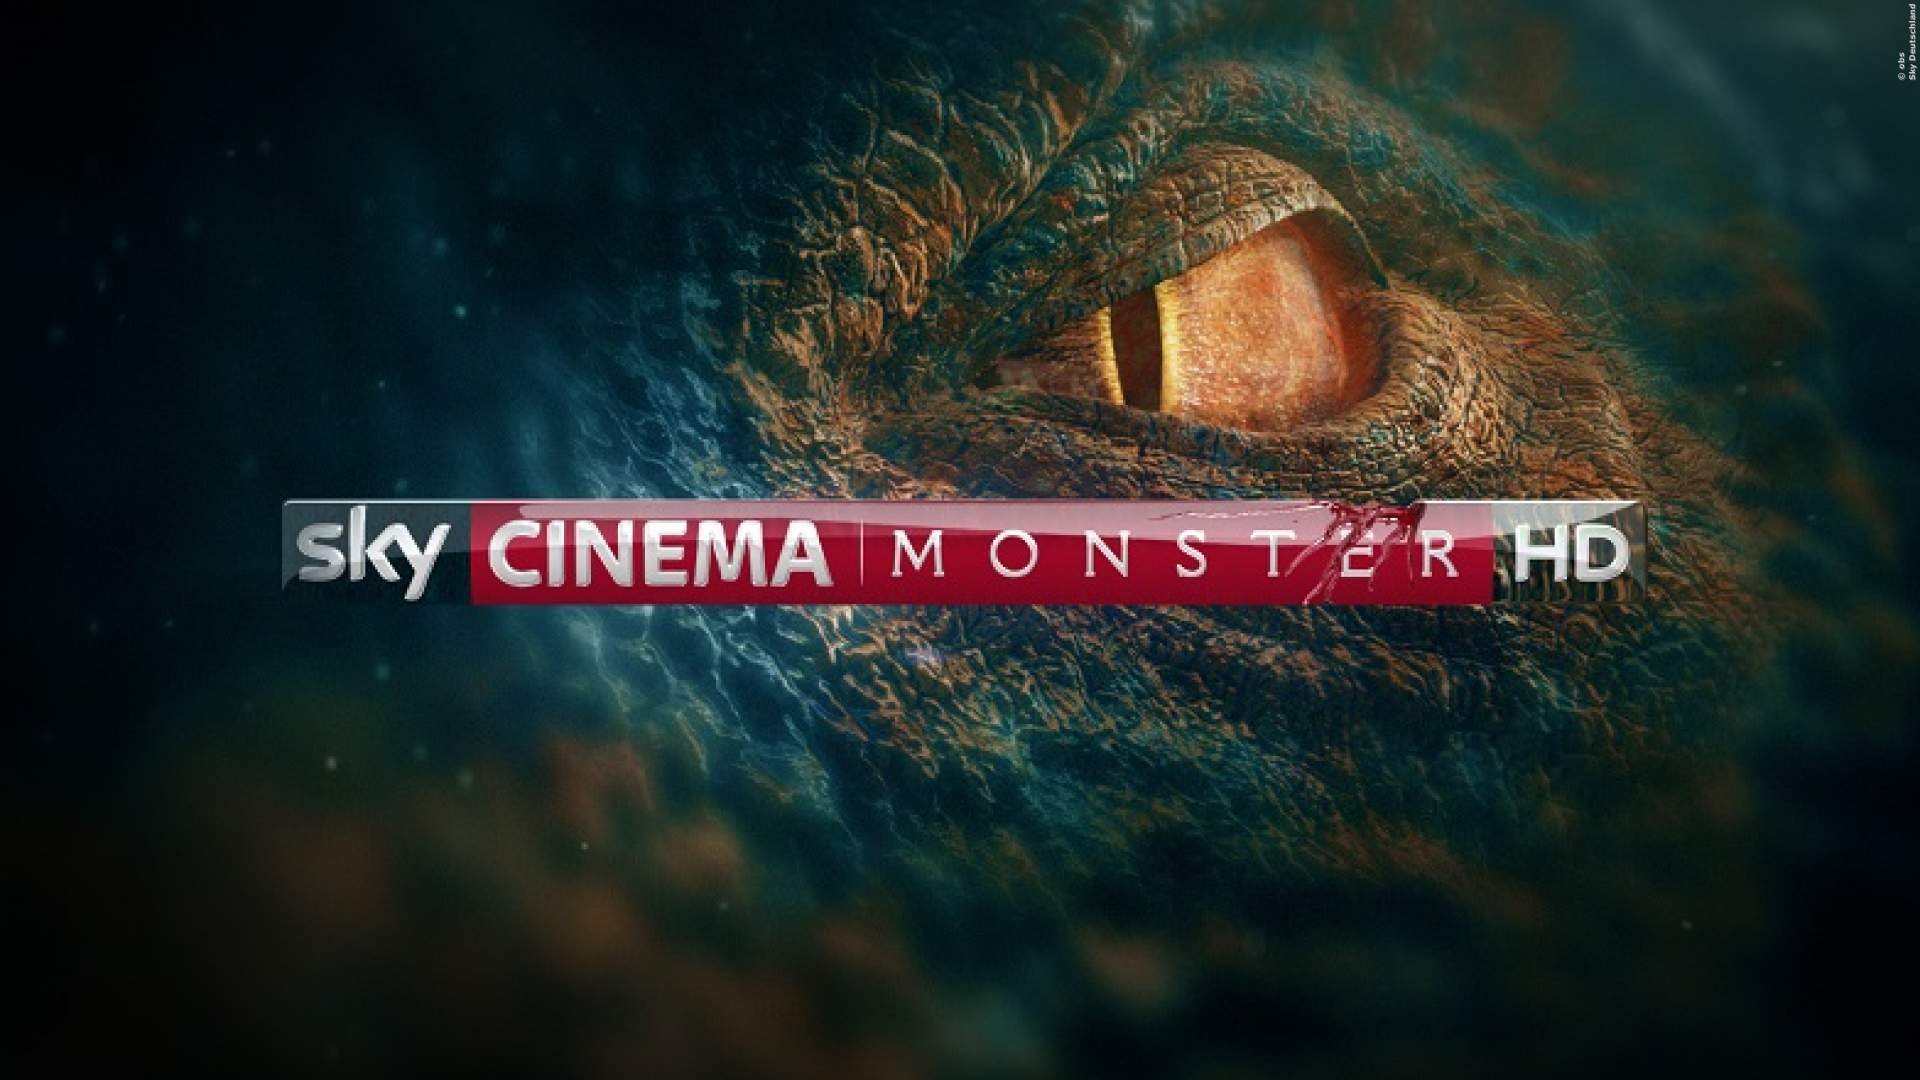 Sky Cinema Monster HD: Legendäre Film-Monster mit eigenem Sender